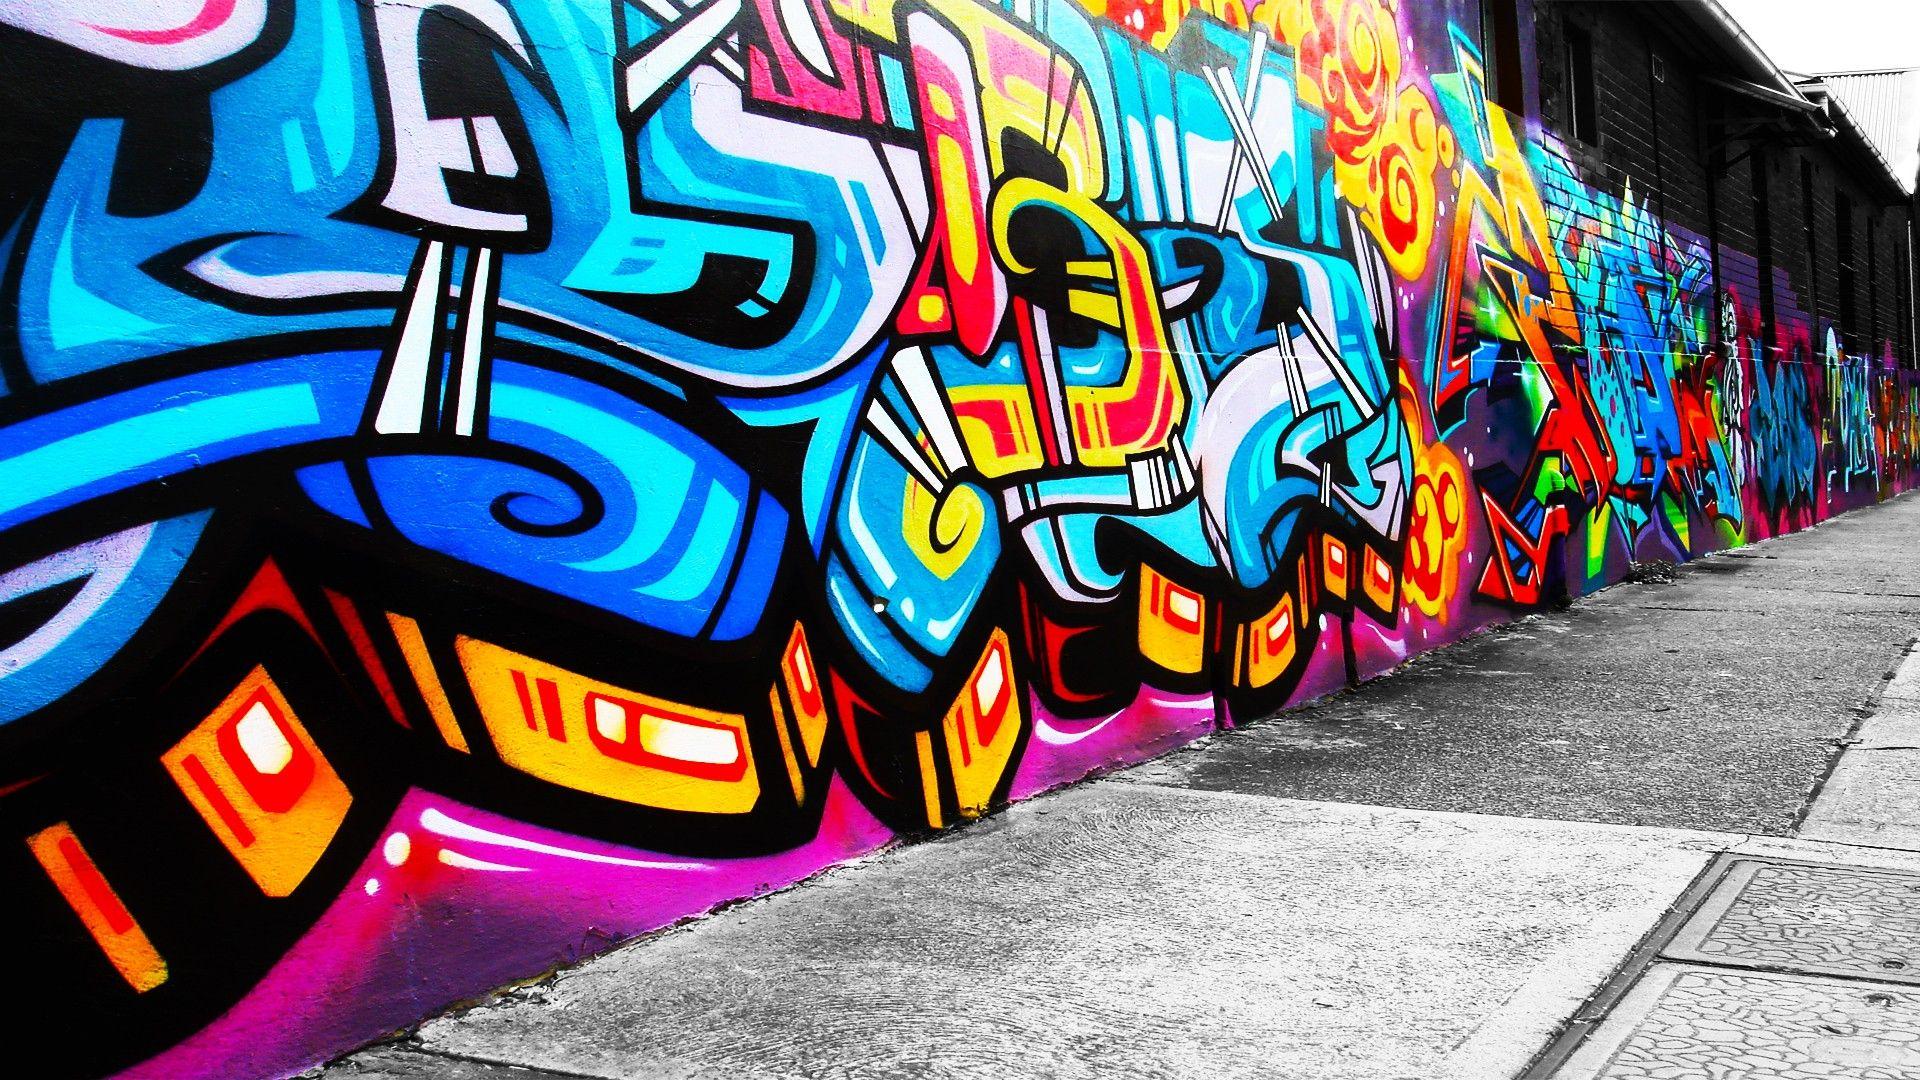 Artistic Graffiti Street Art Wallpaper 1539694 Wallbasecc